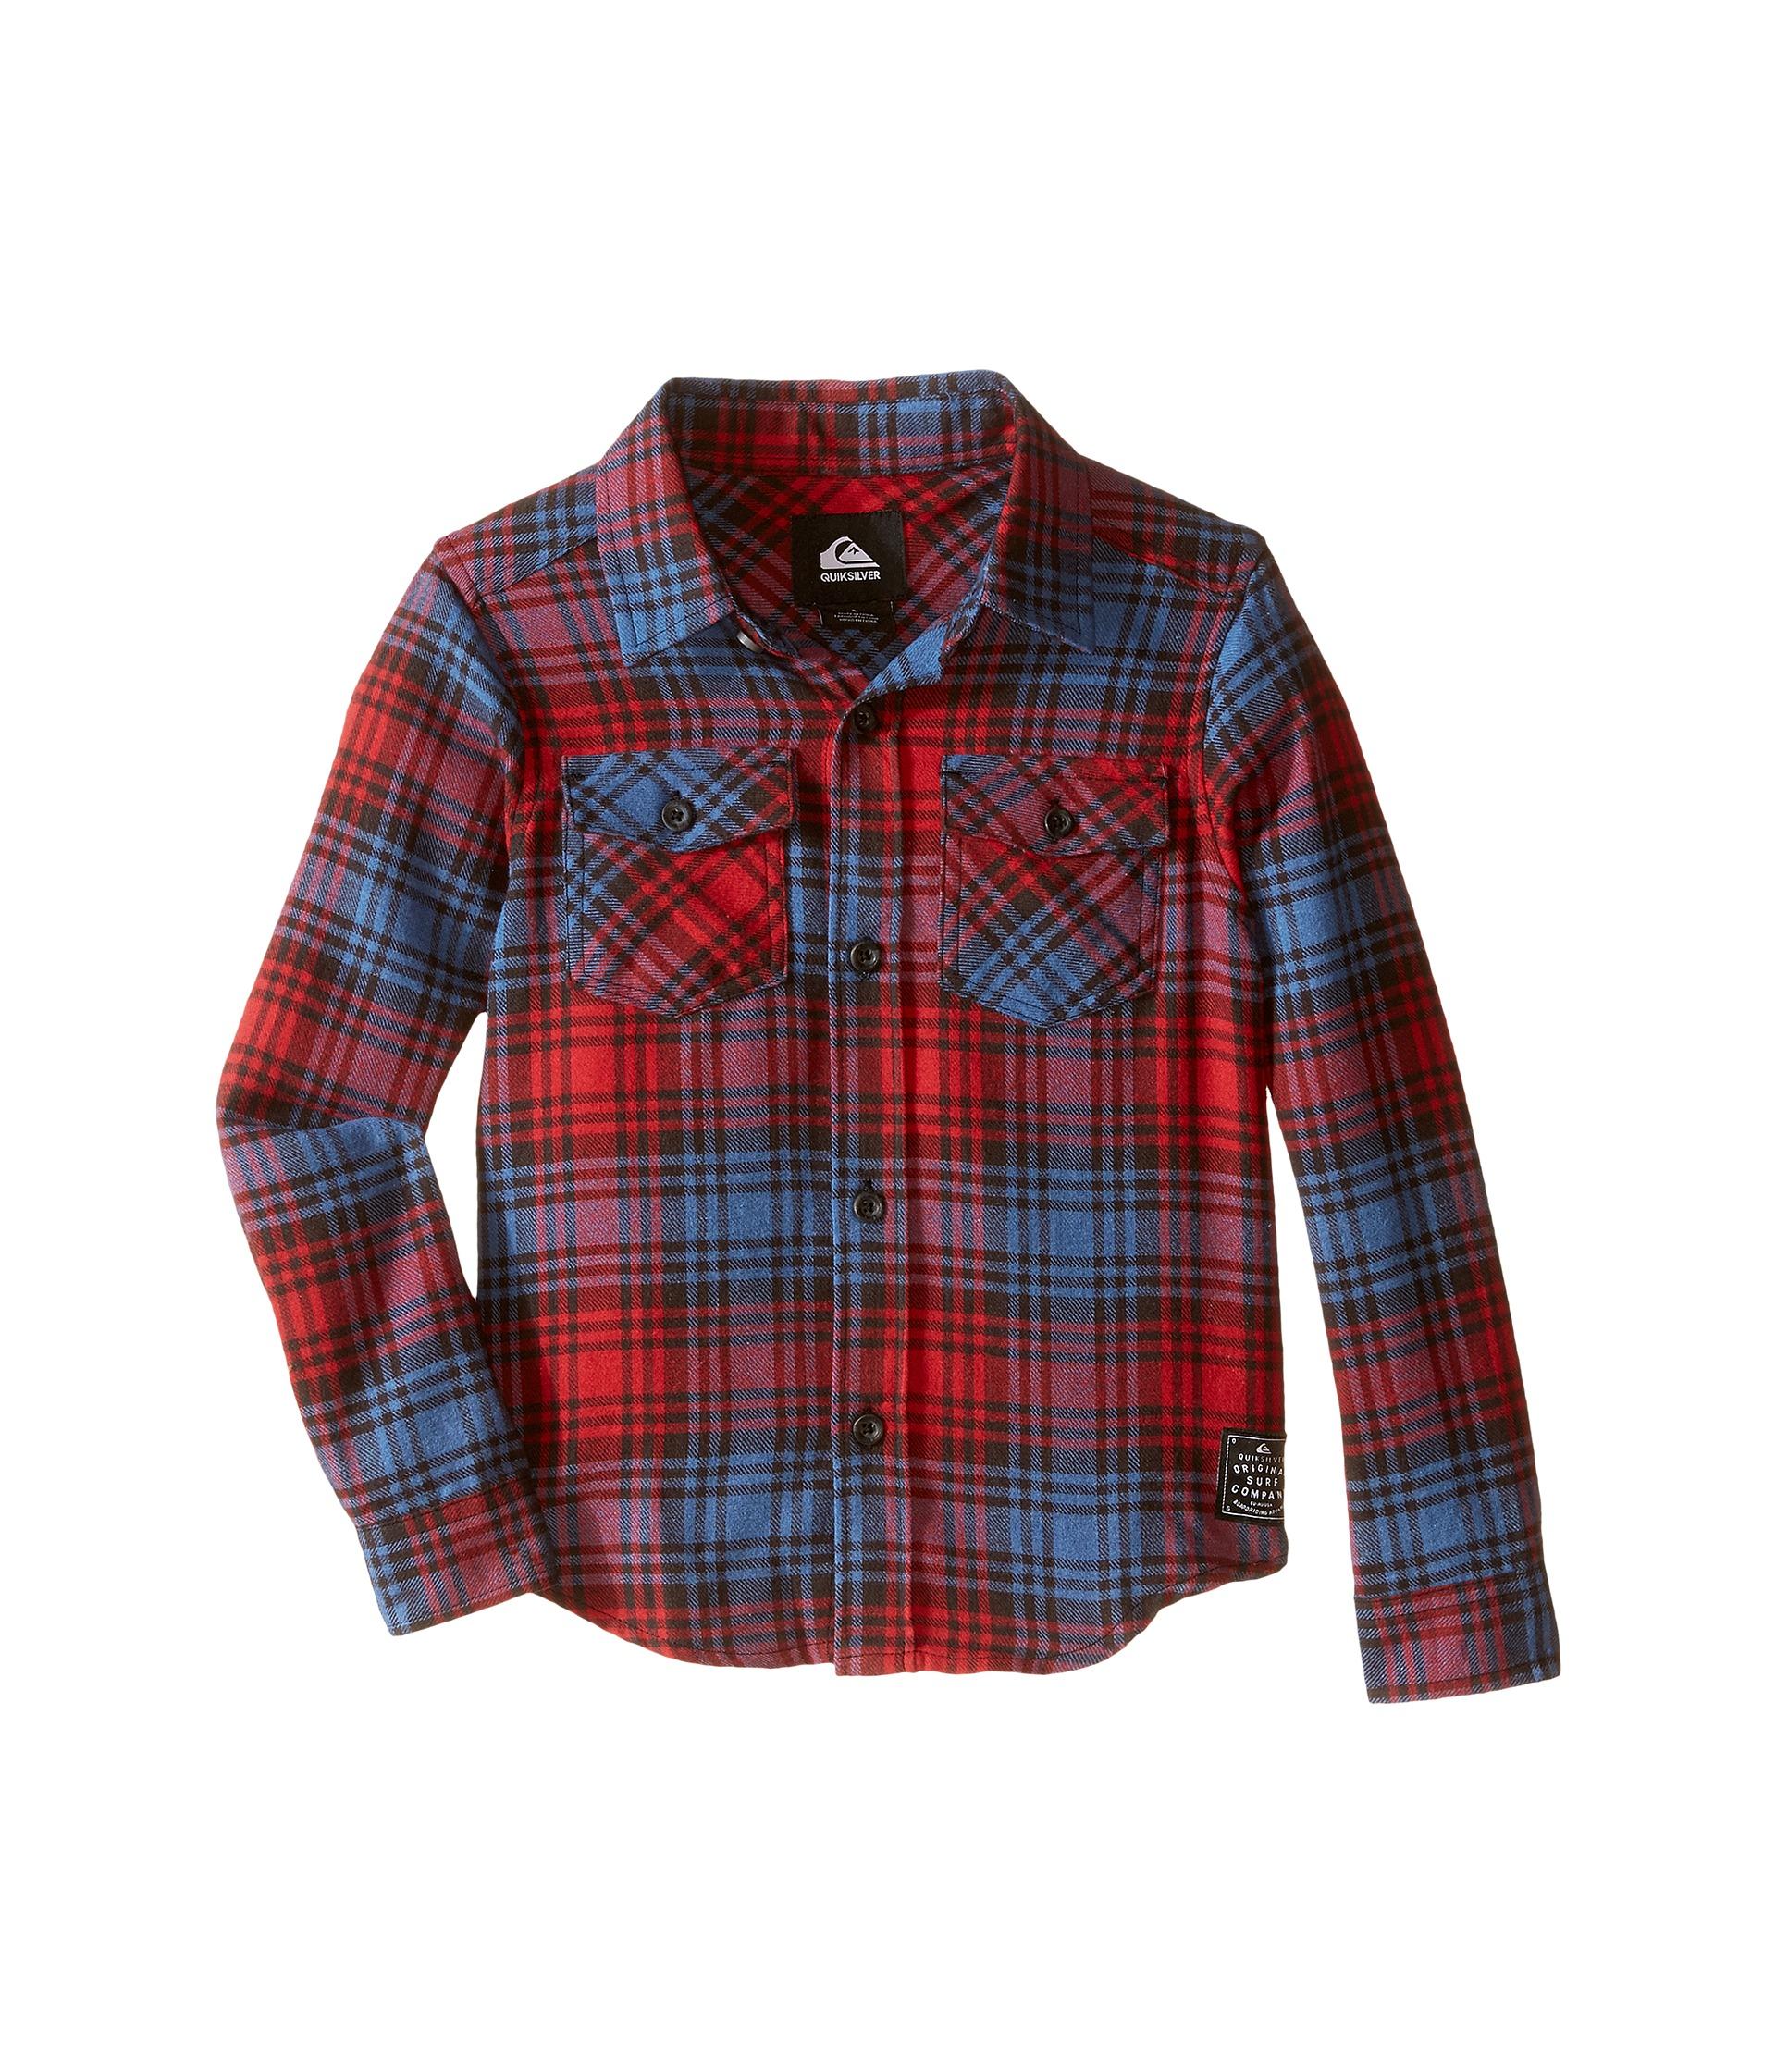 Quiksilver Kids Everyday Flannel Shirt (Toddler/Little Kids)